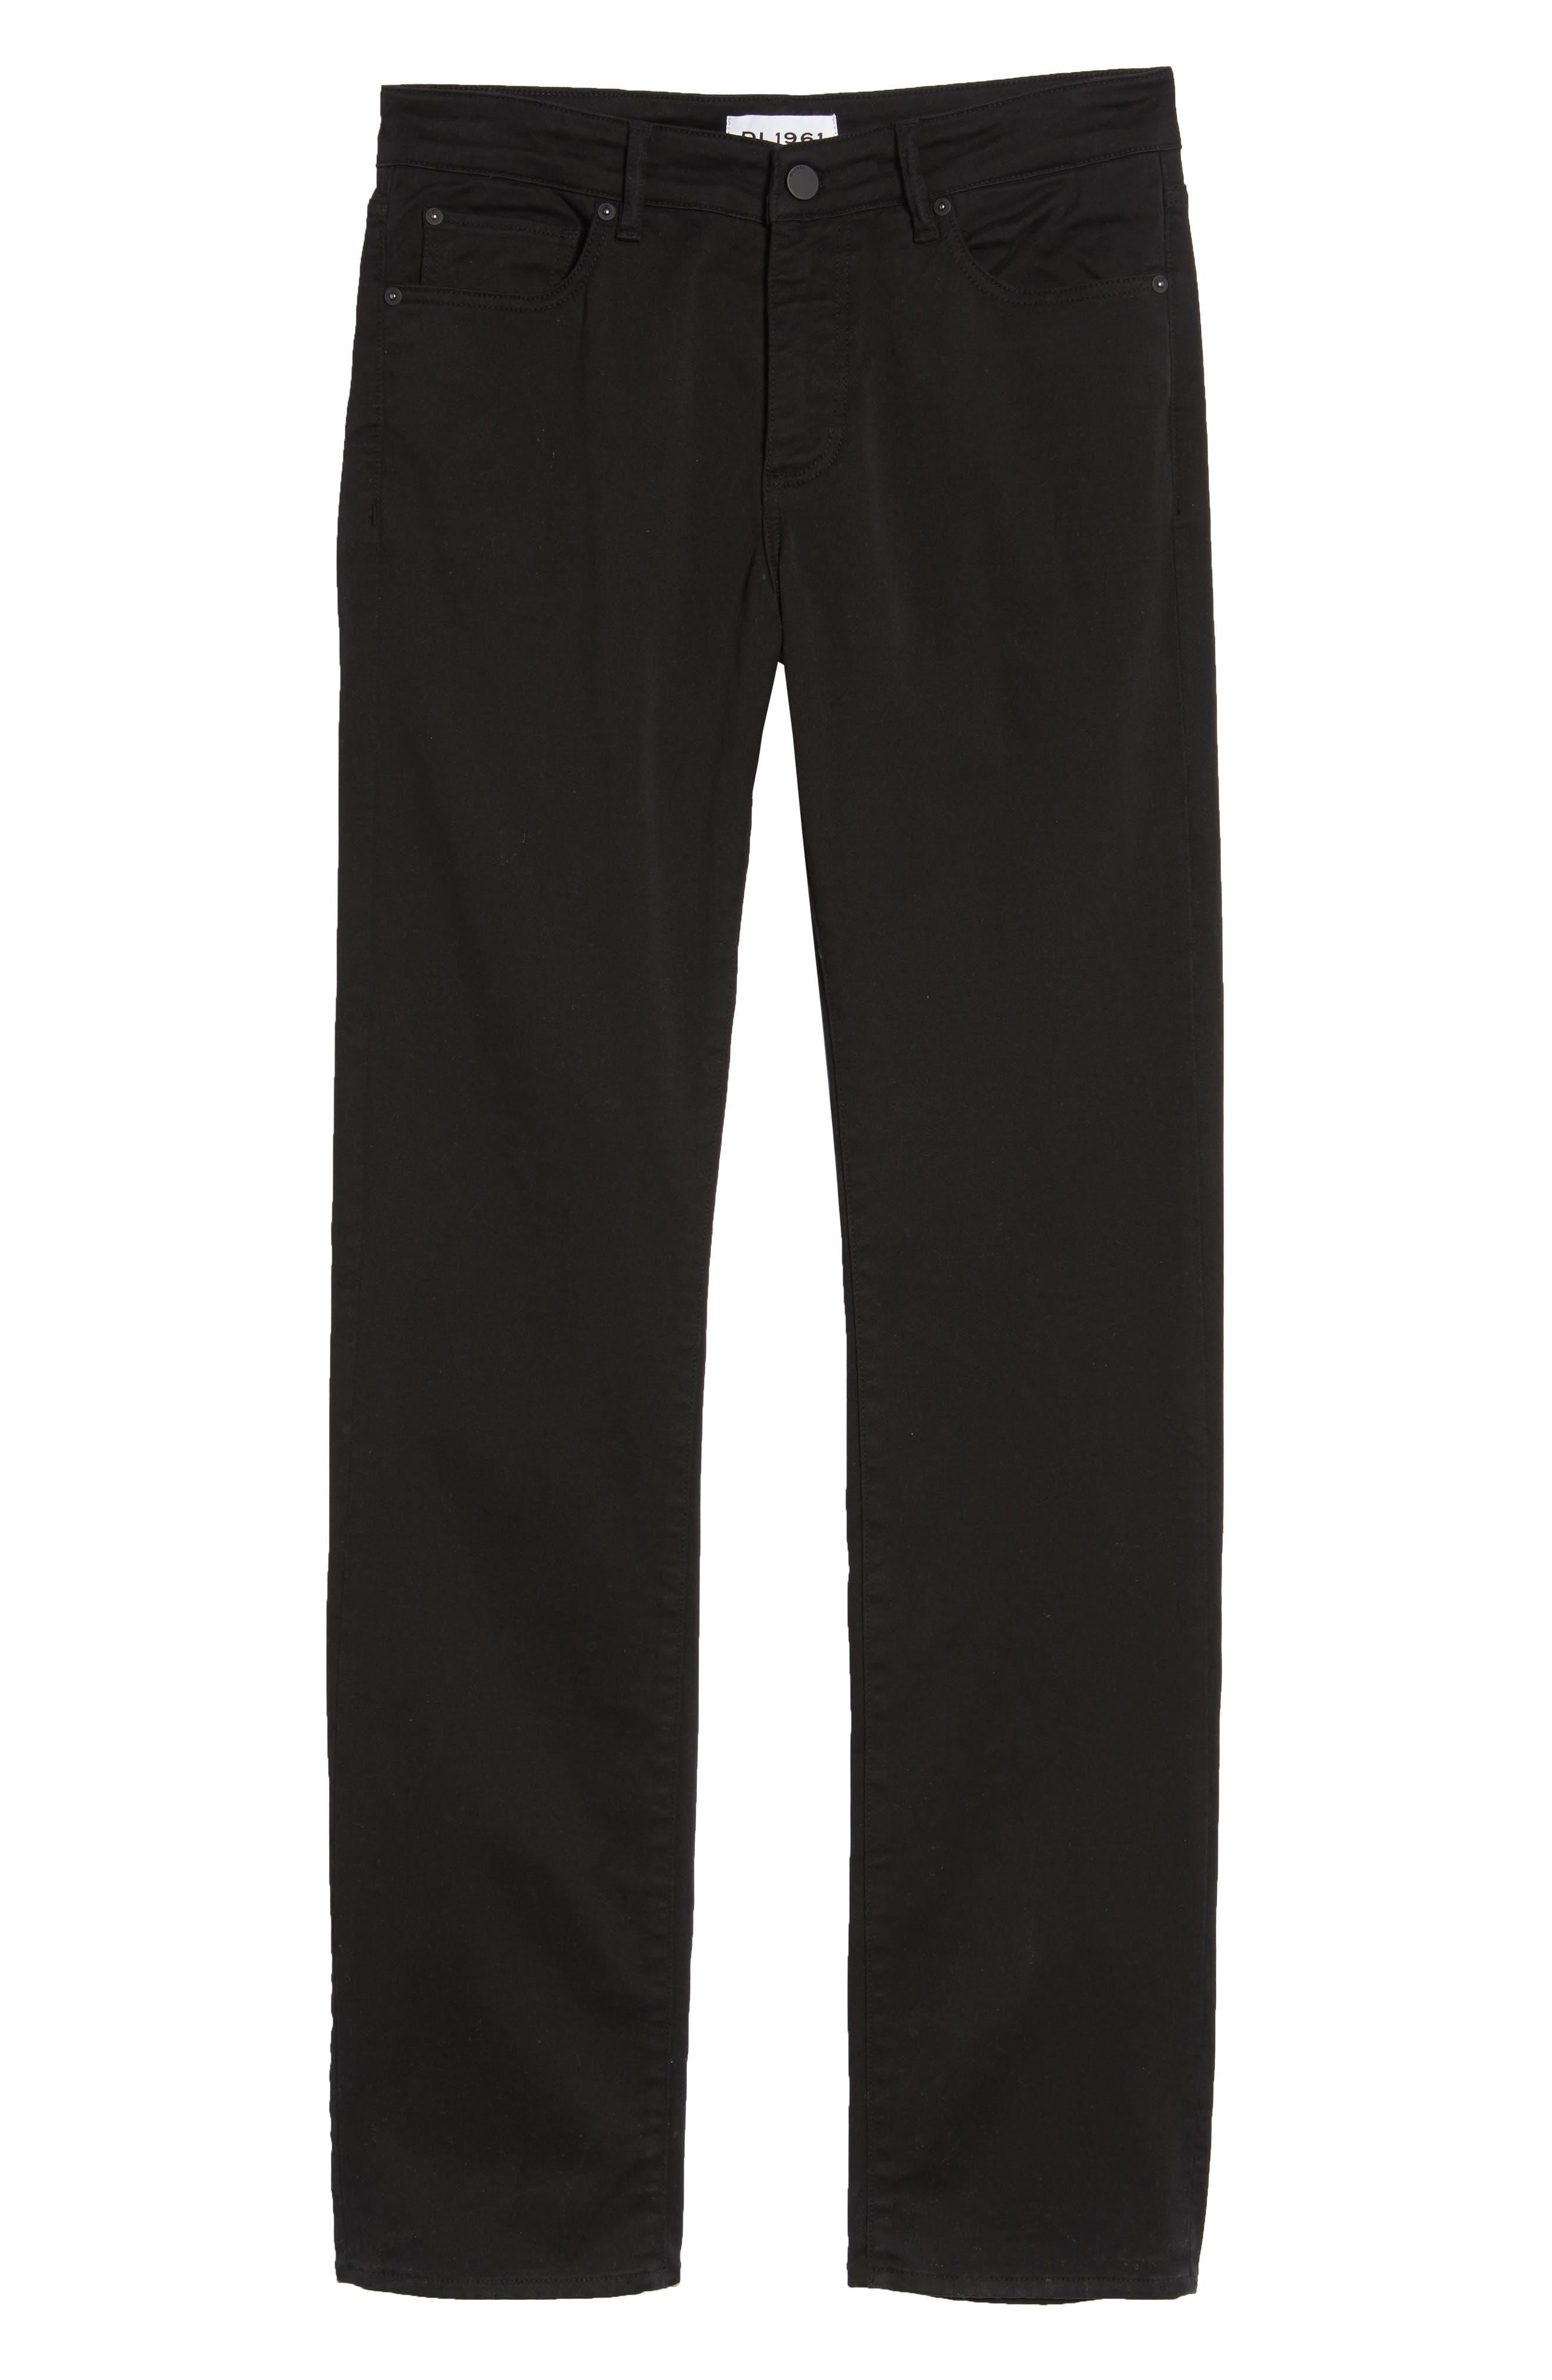 Avery Slim Straight Chino Pants,                             Alternate thumbnail 6, color,                             COAL